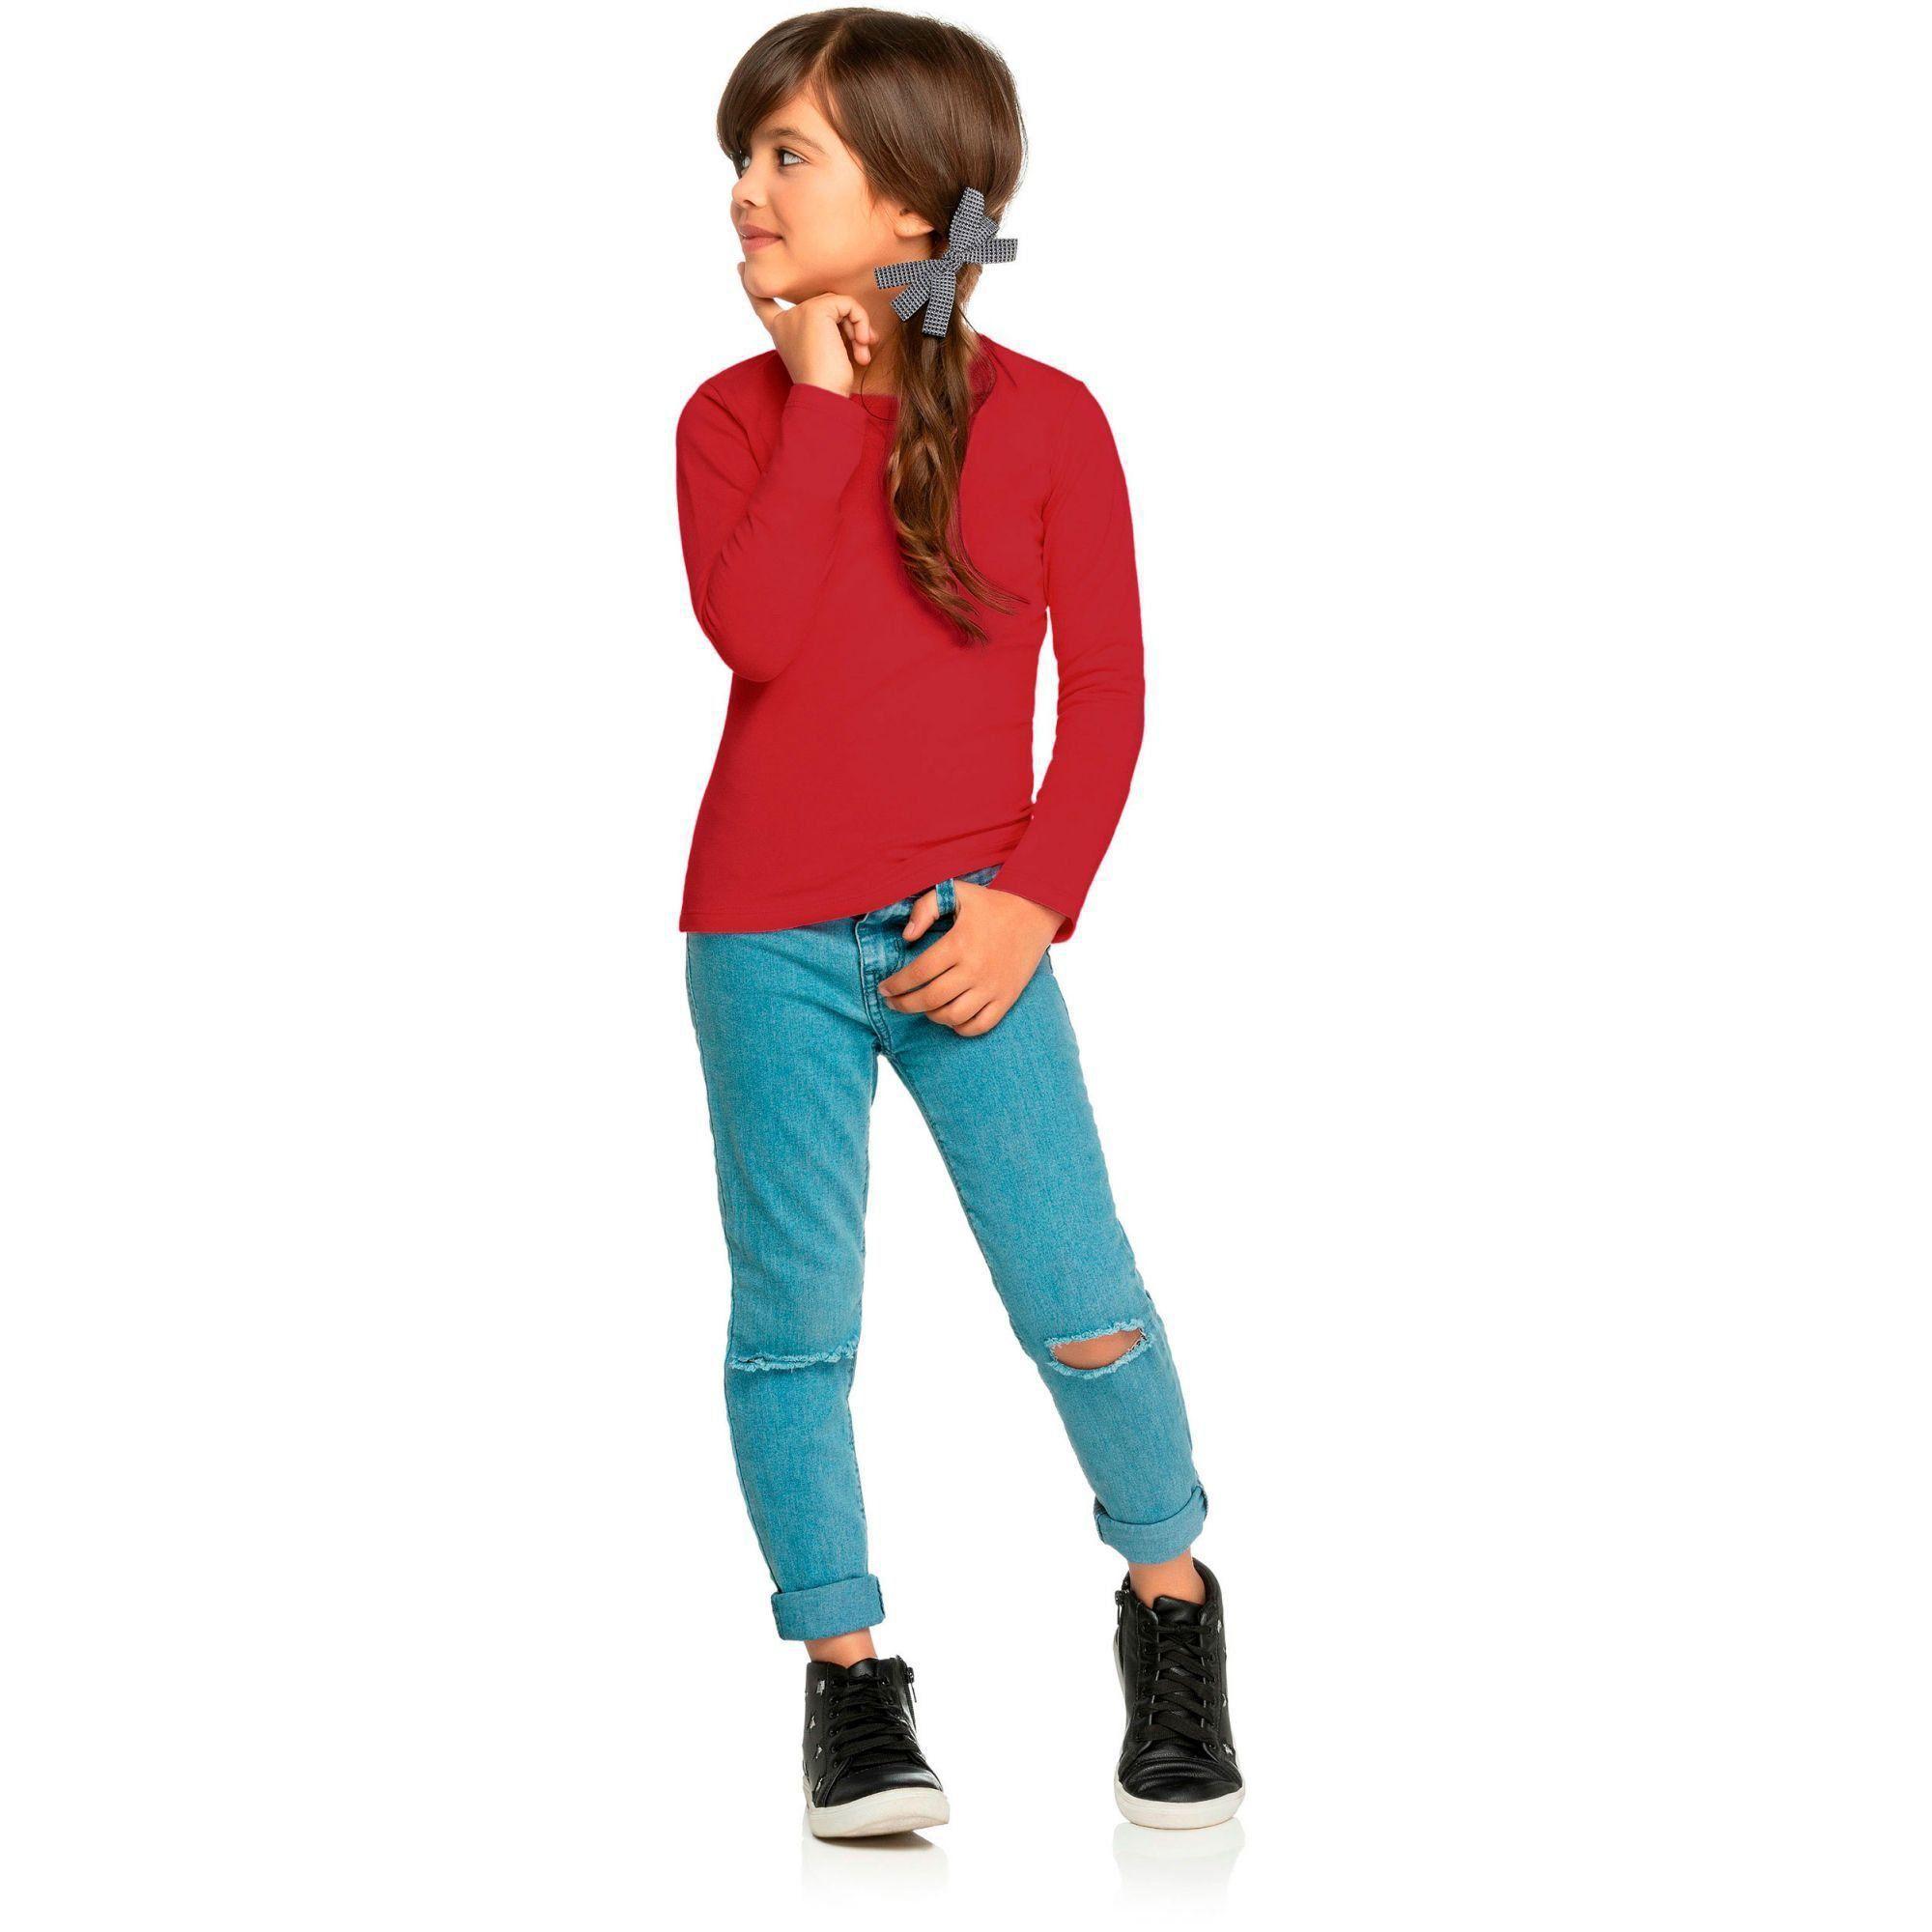 Blusa Infantil Feminina Inverno Vermelha Elian